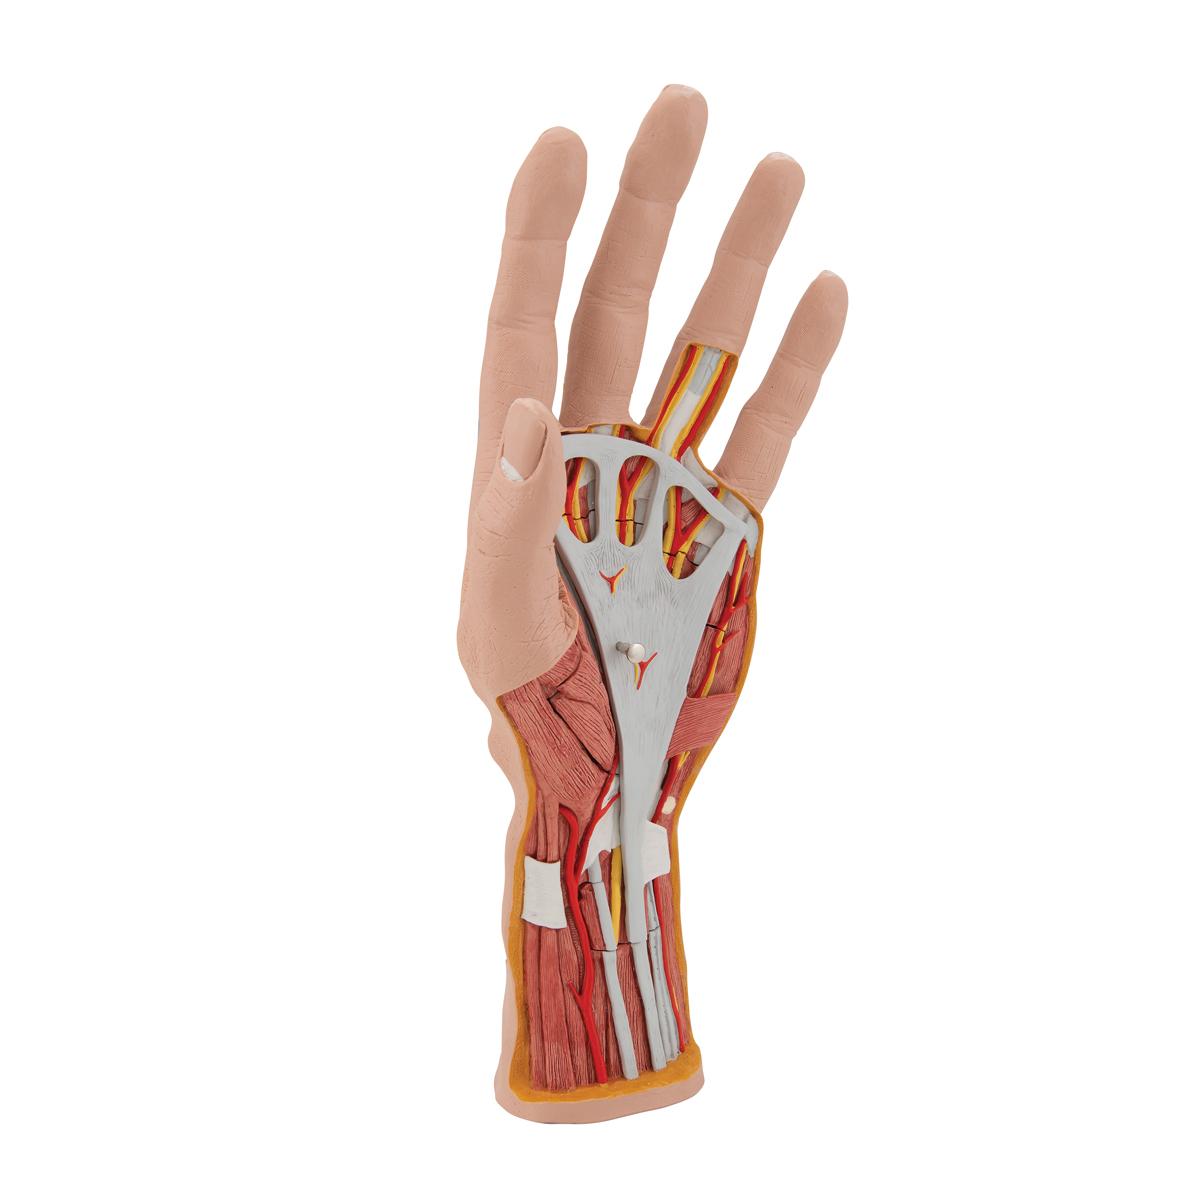 Großartig Hand Anatomie Modell Fotos - Anatomie Ideen - finotti.info